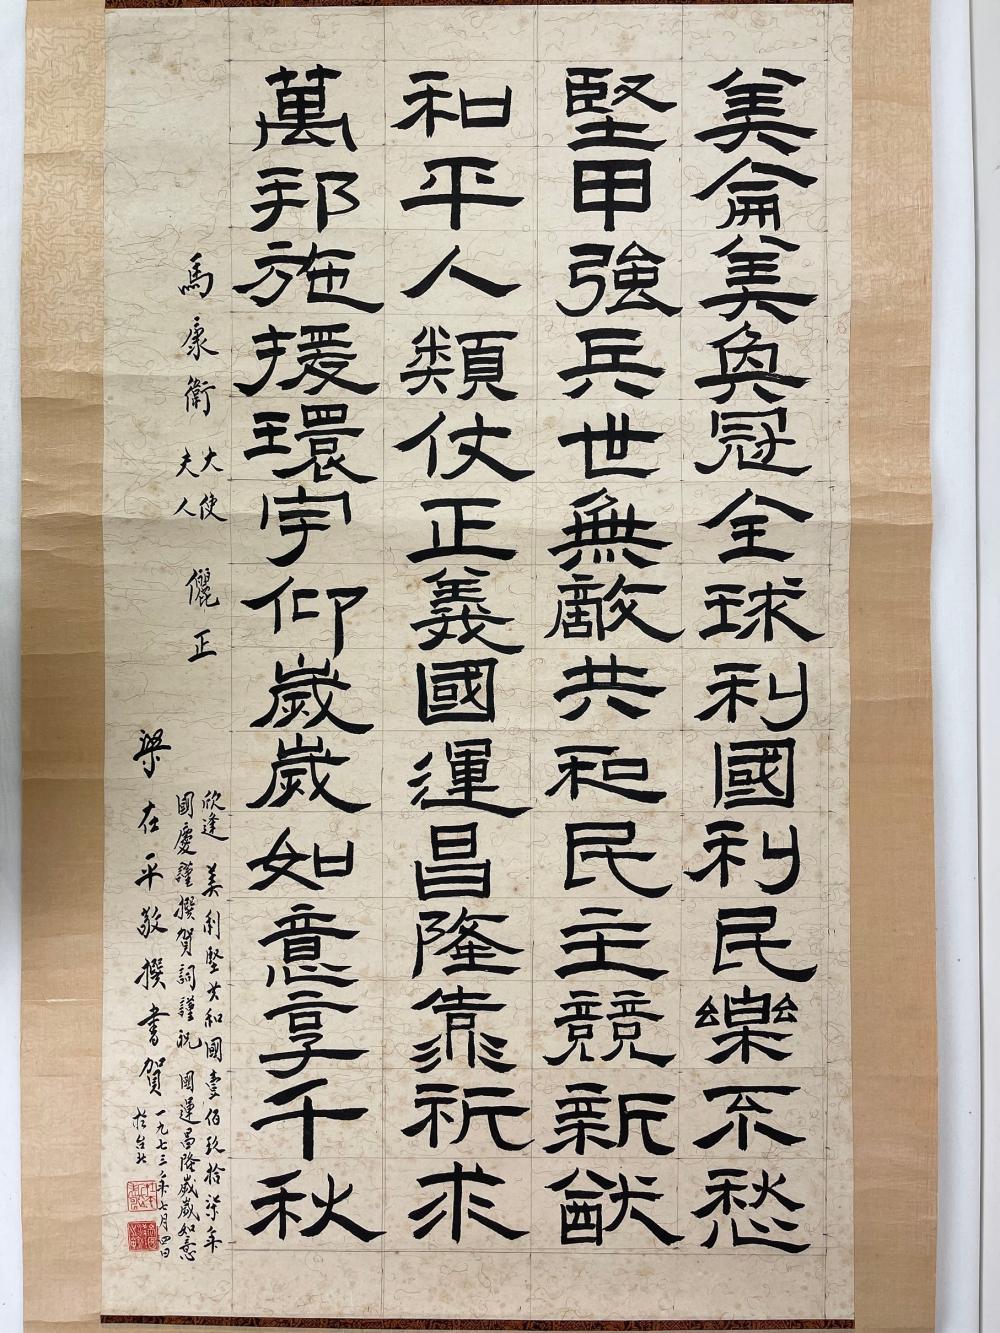 Liang Zaiping Chinese Calligraphy